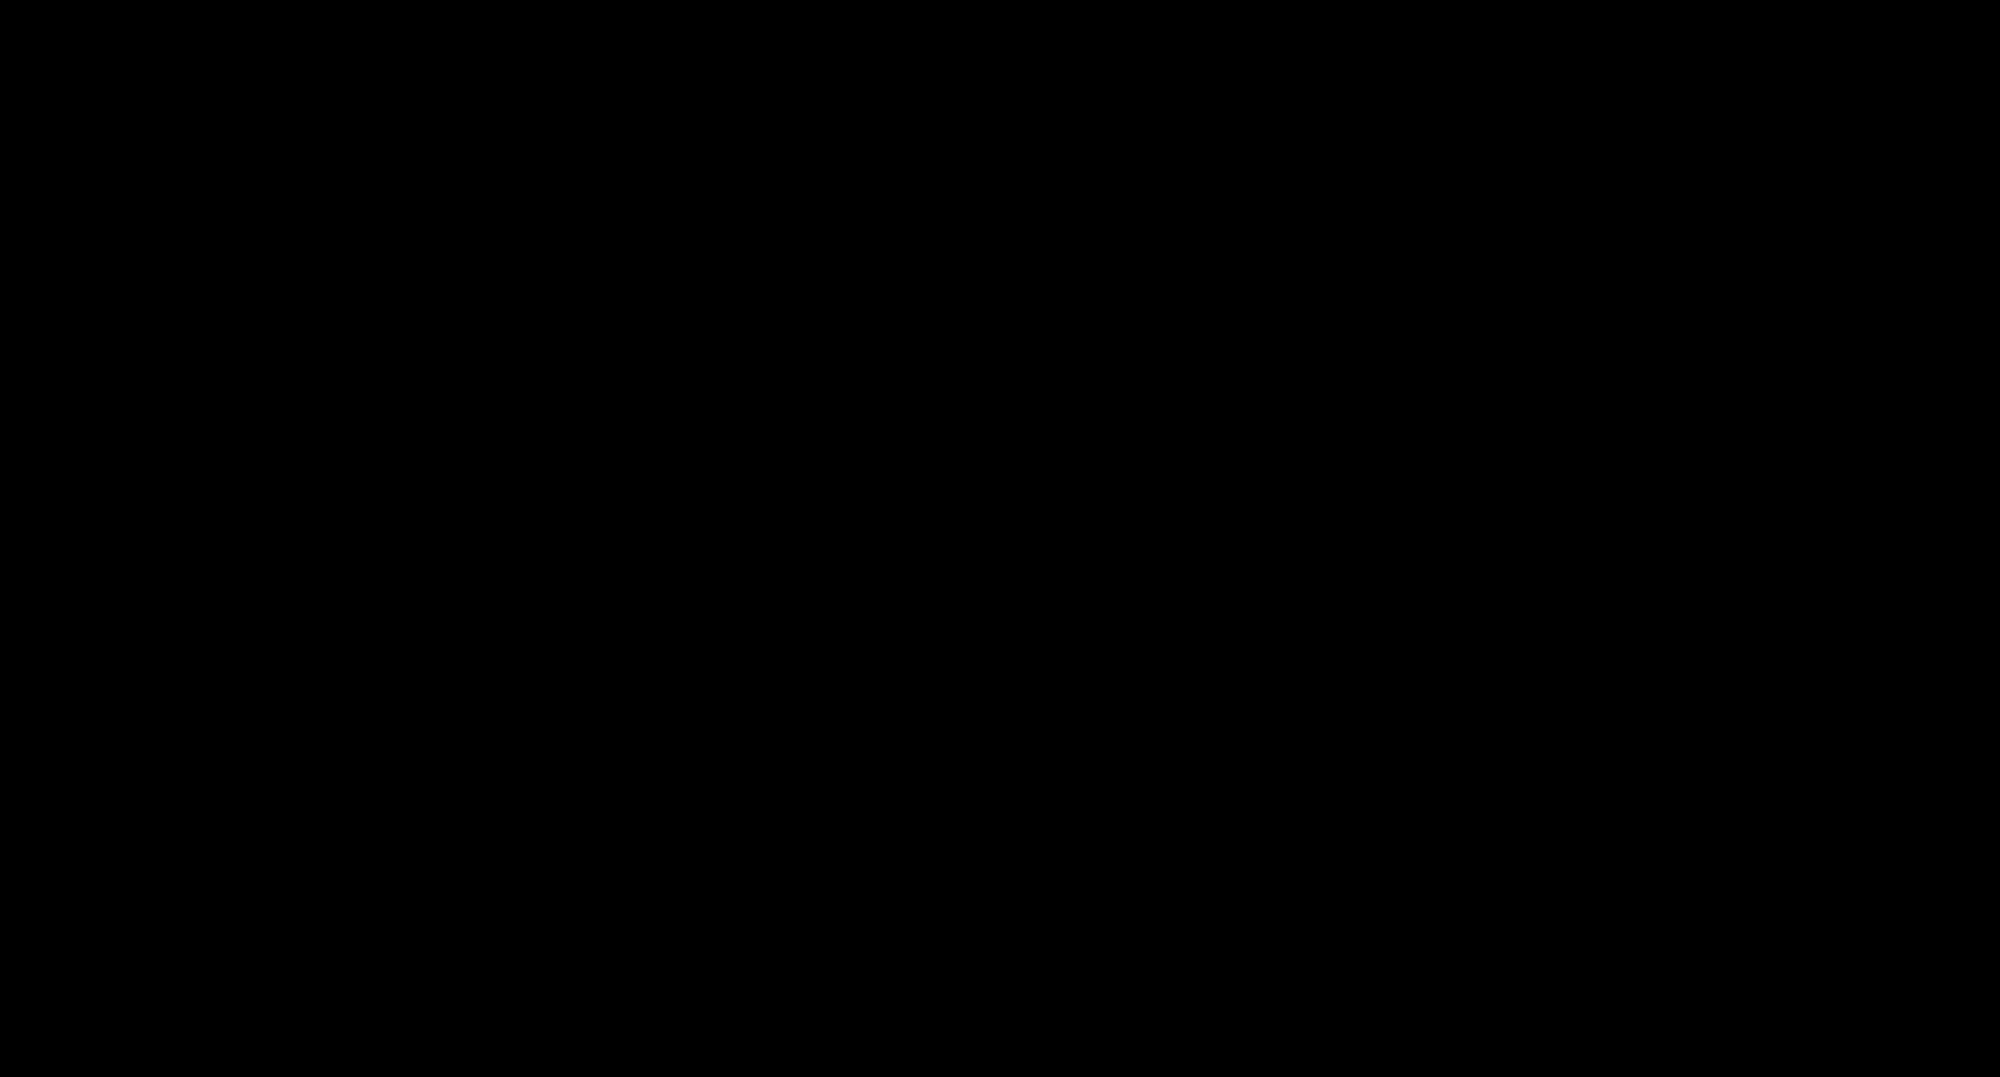 On emaze httpsenwikipediaorgwikipenicillin. Medication clipart penicillin